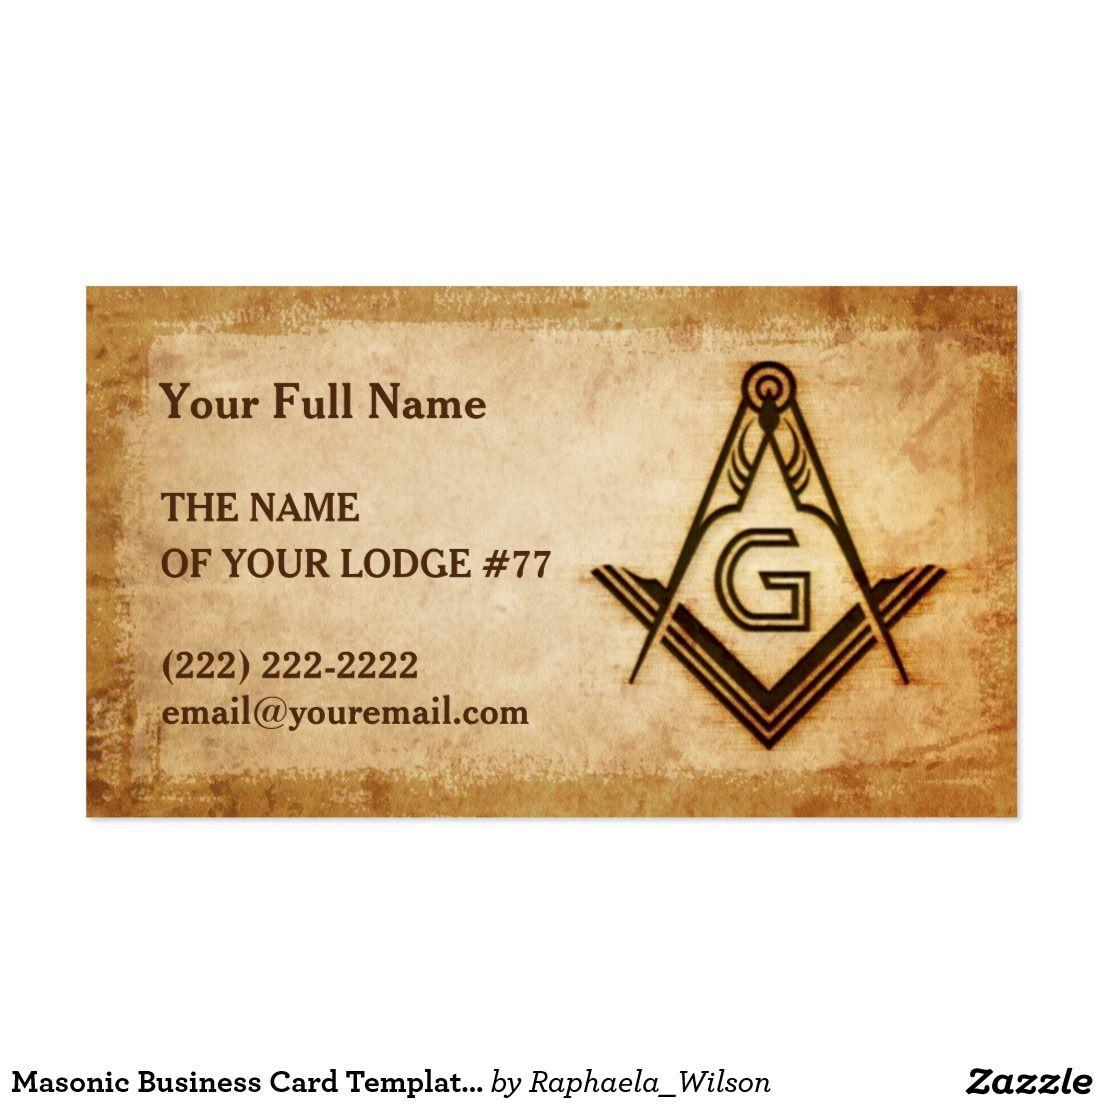 Masonic Business Card Template Rustic Parchment Custom Masonic